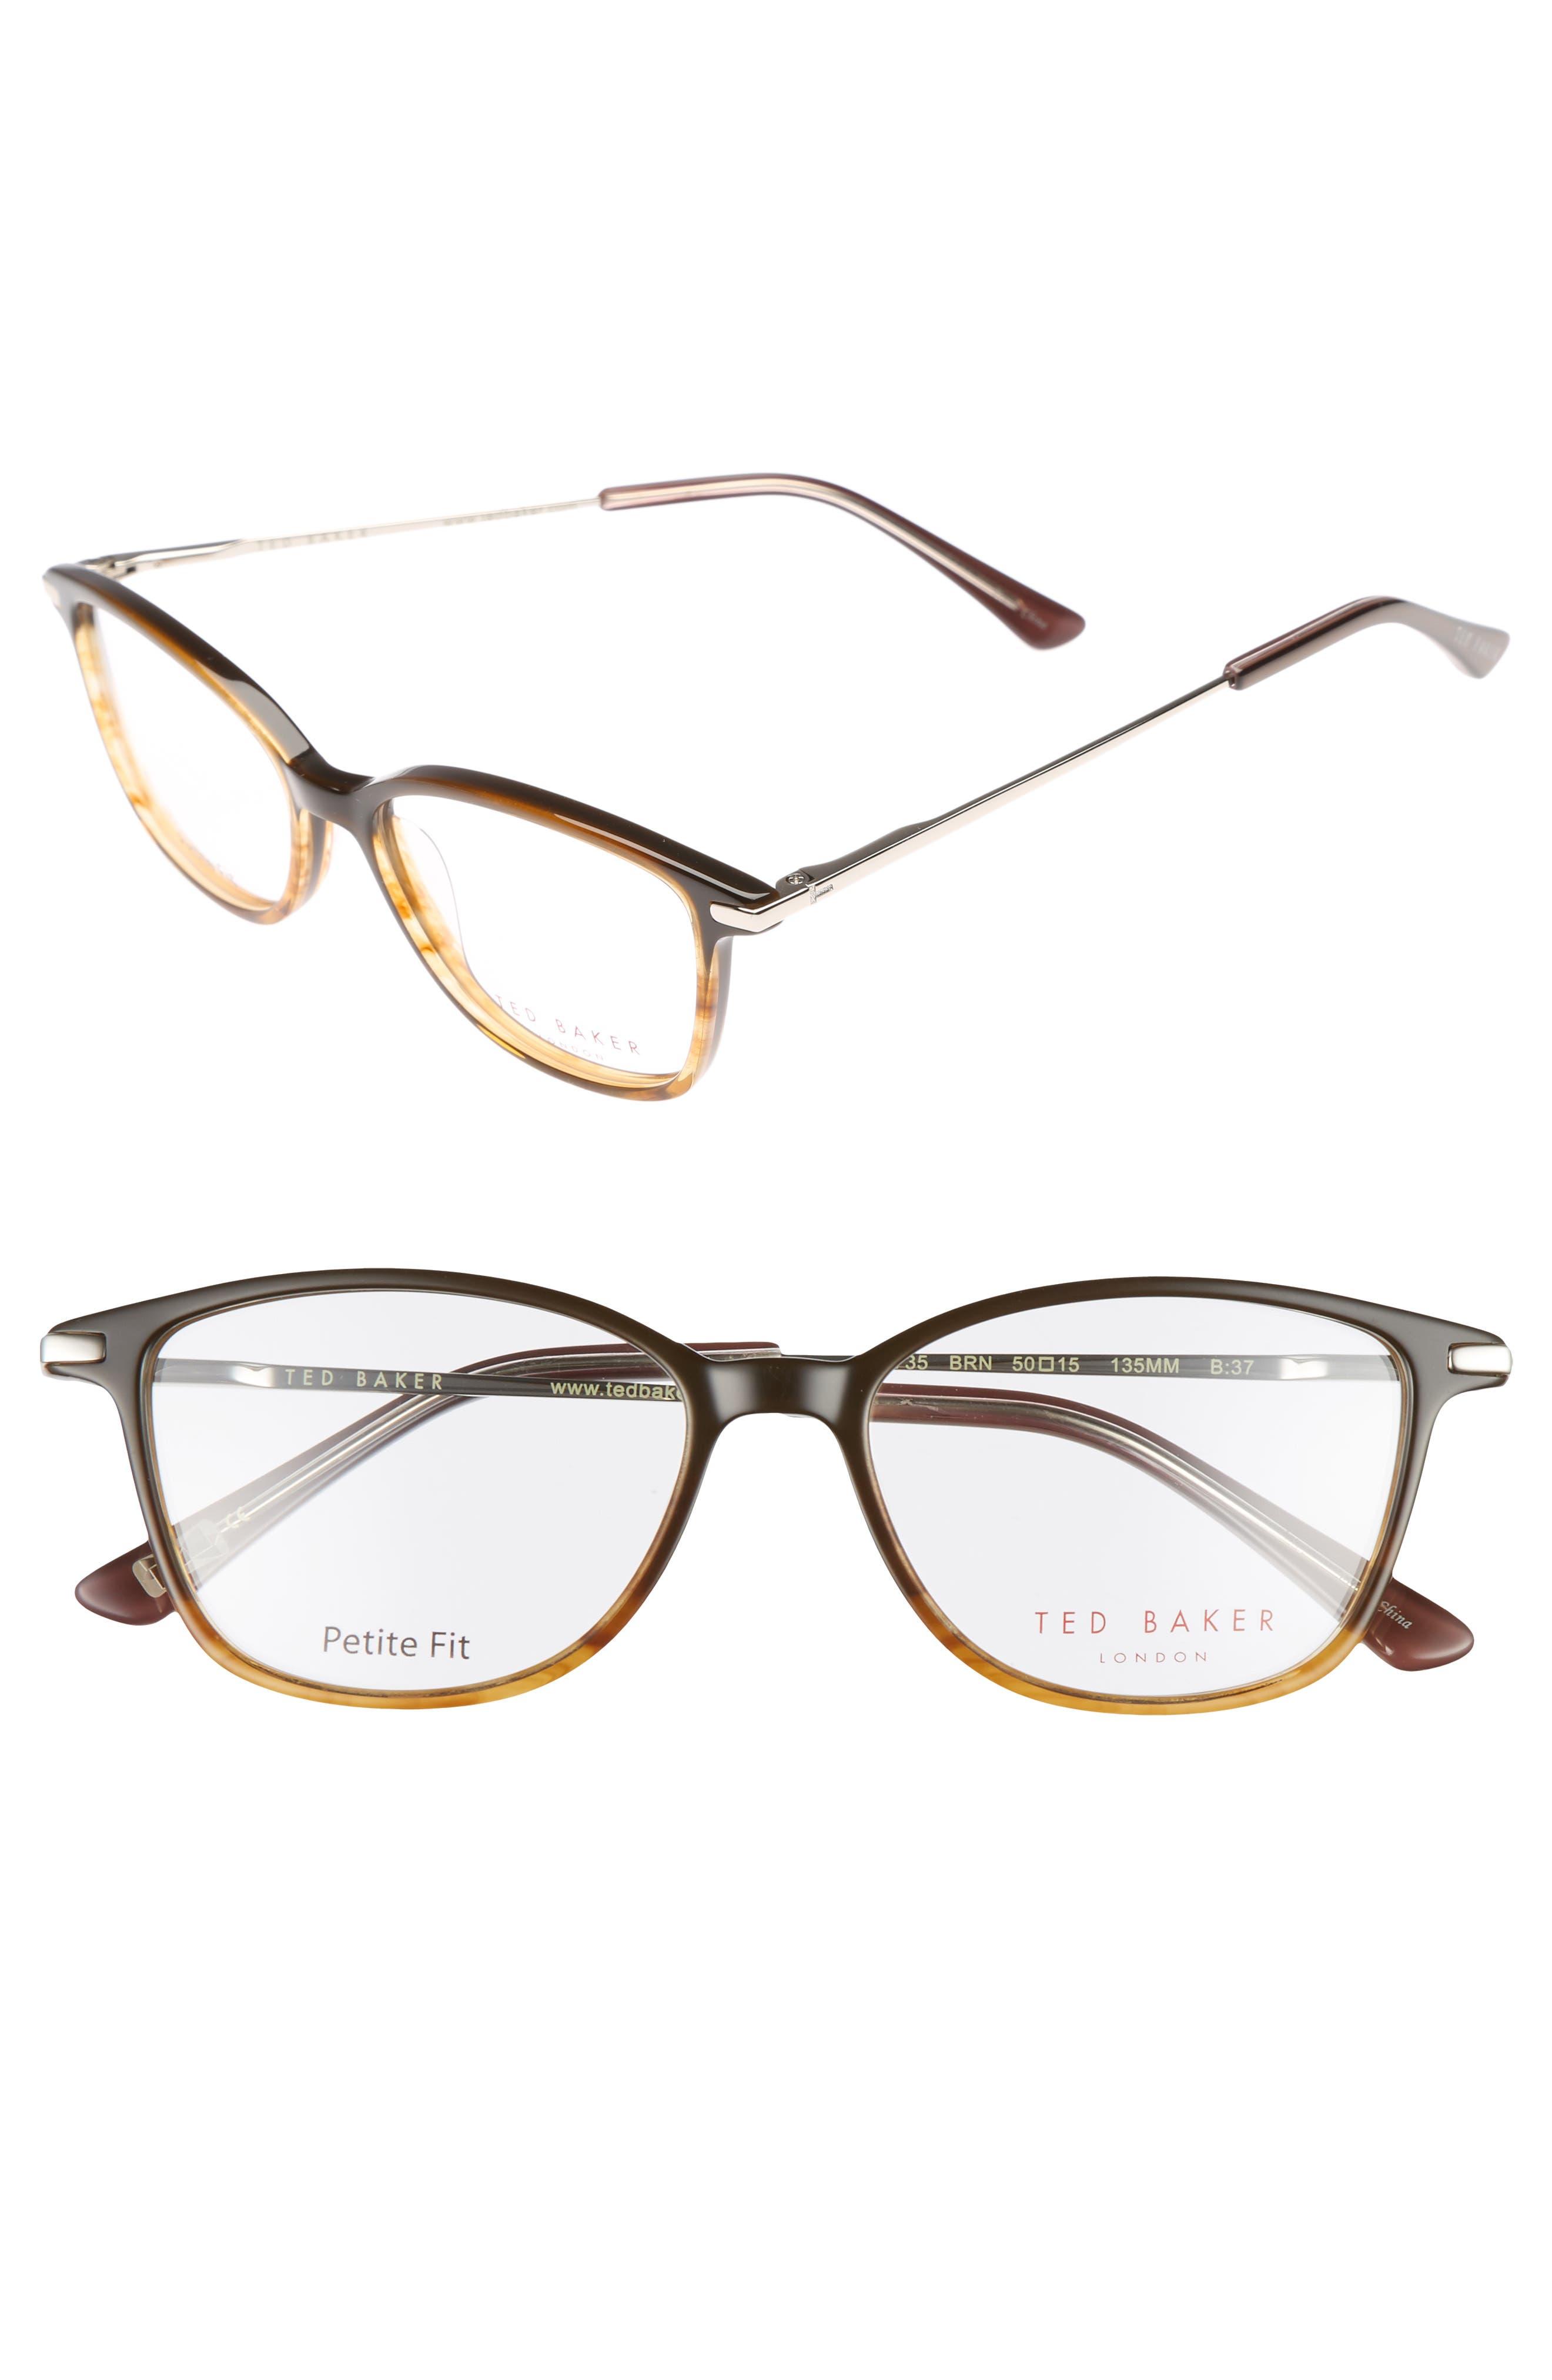 Petite Fit 50mm Optical Glasses,                         Main,                         color,